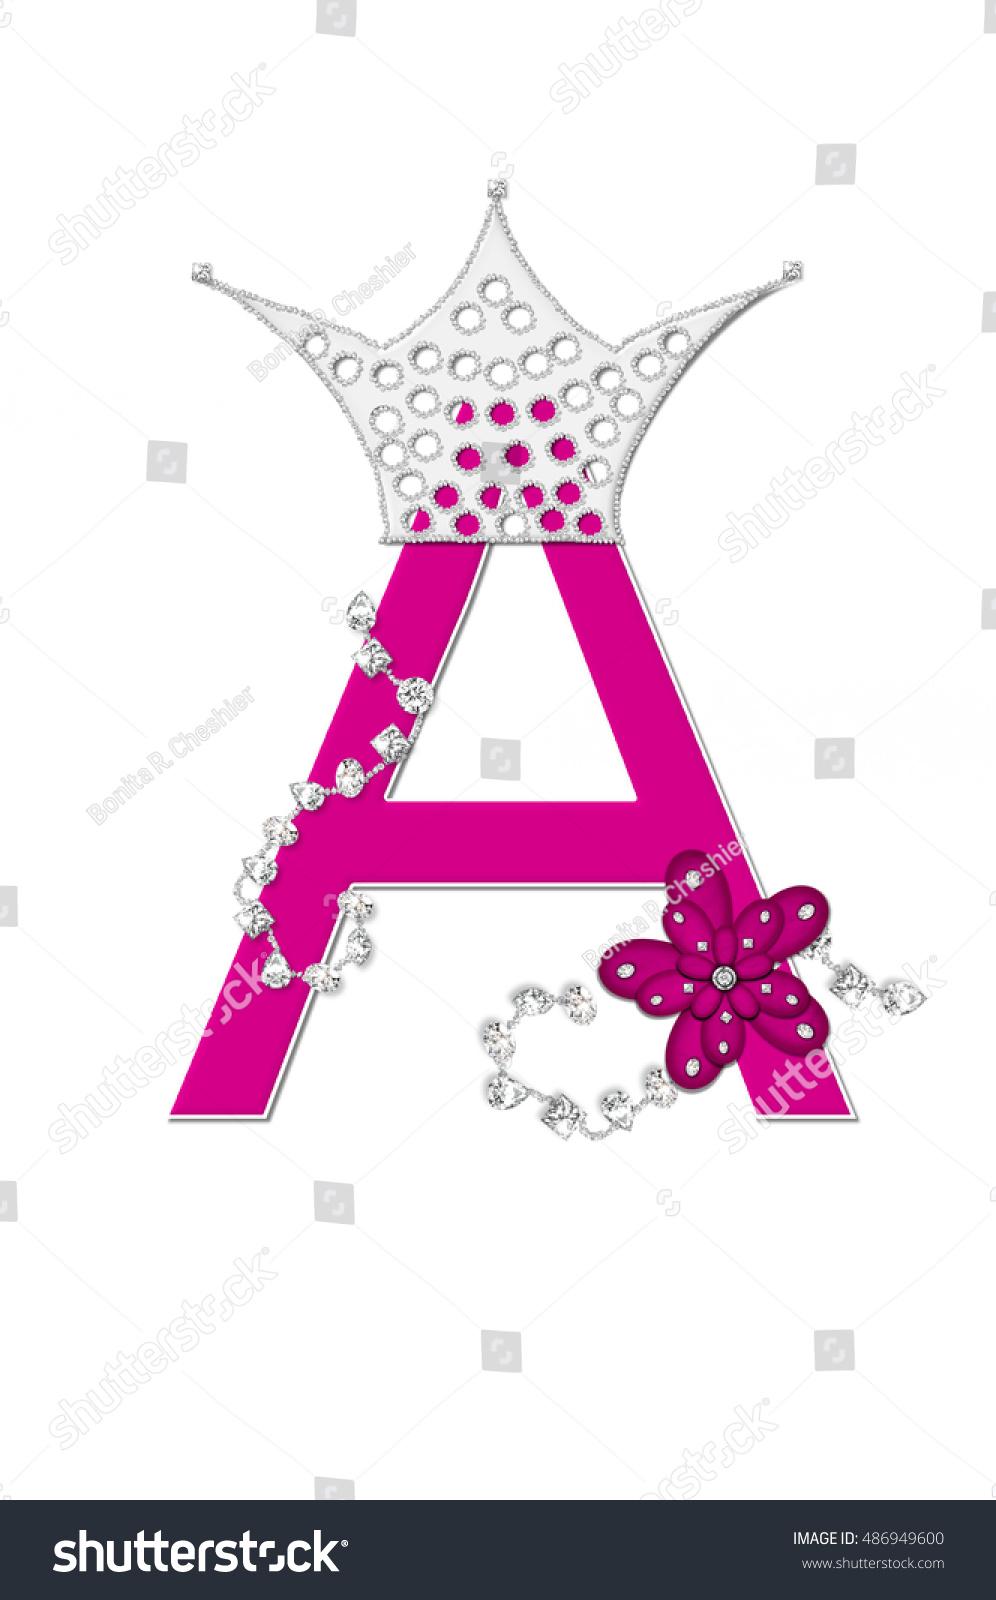 letter a images - Ceri.comunicaasl.com